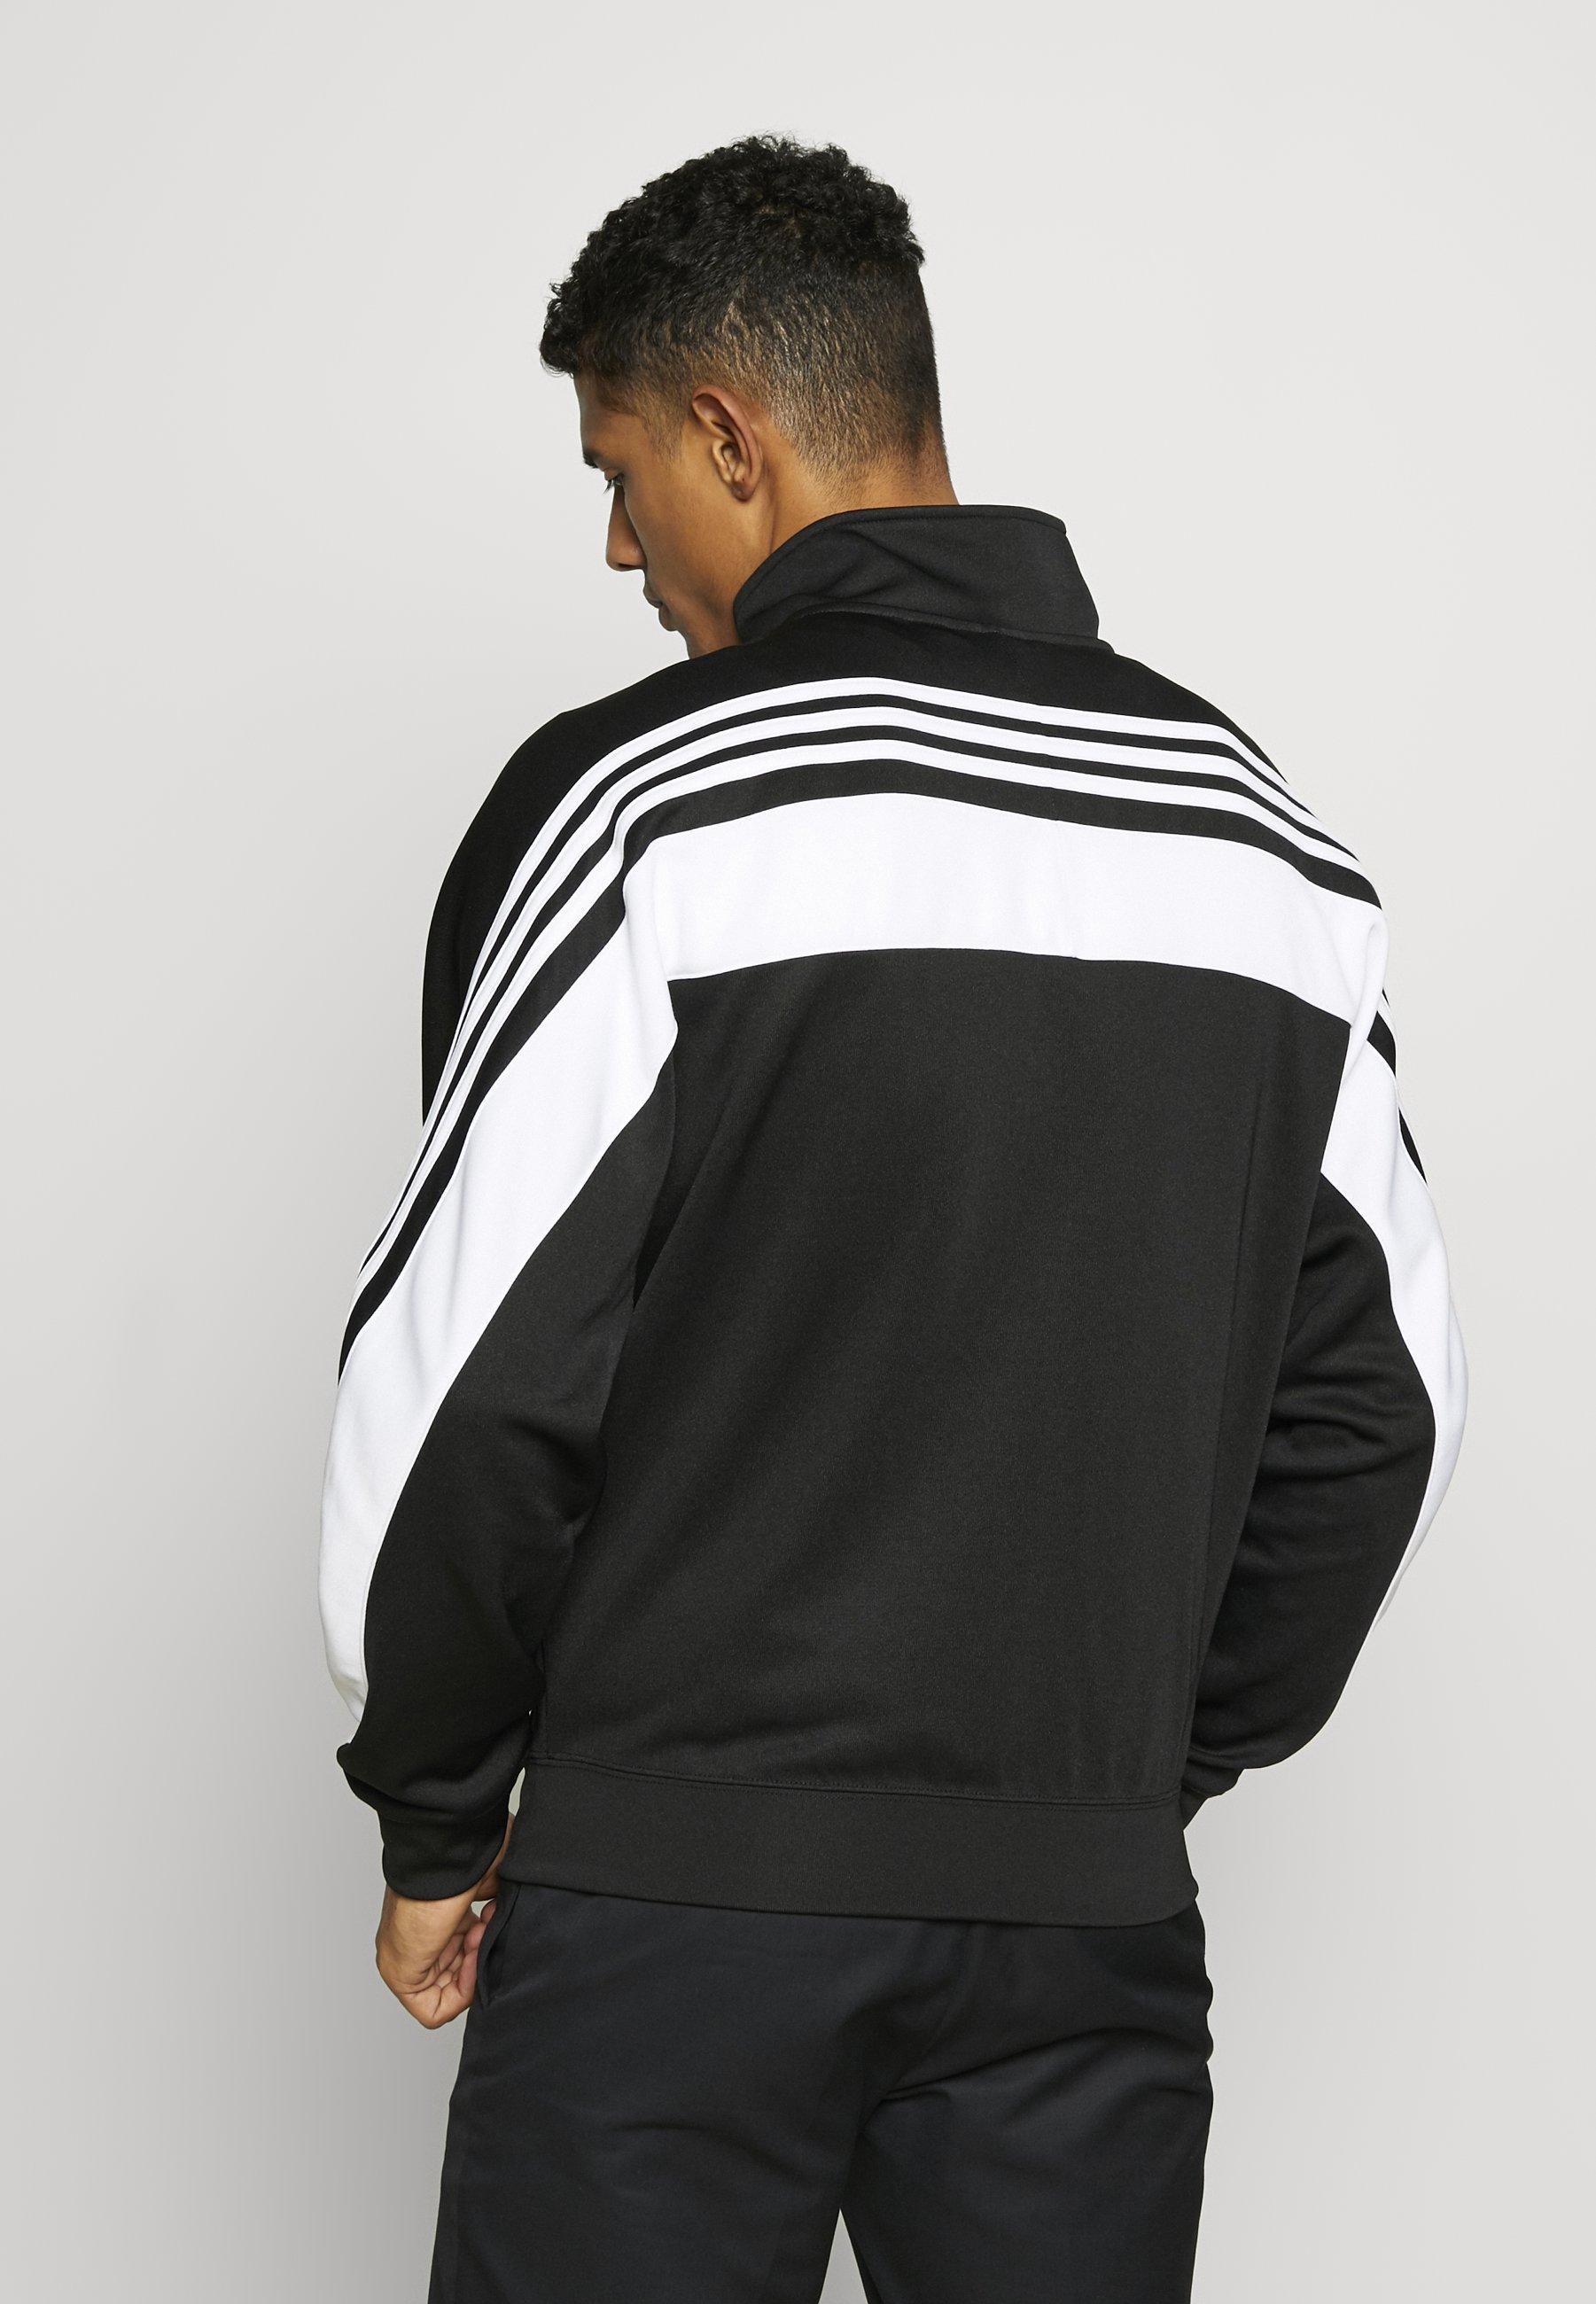 Adidas Originals Stripe Wrap - Treningsjakke Black/white